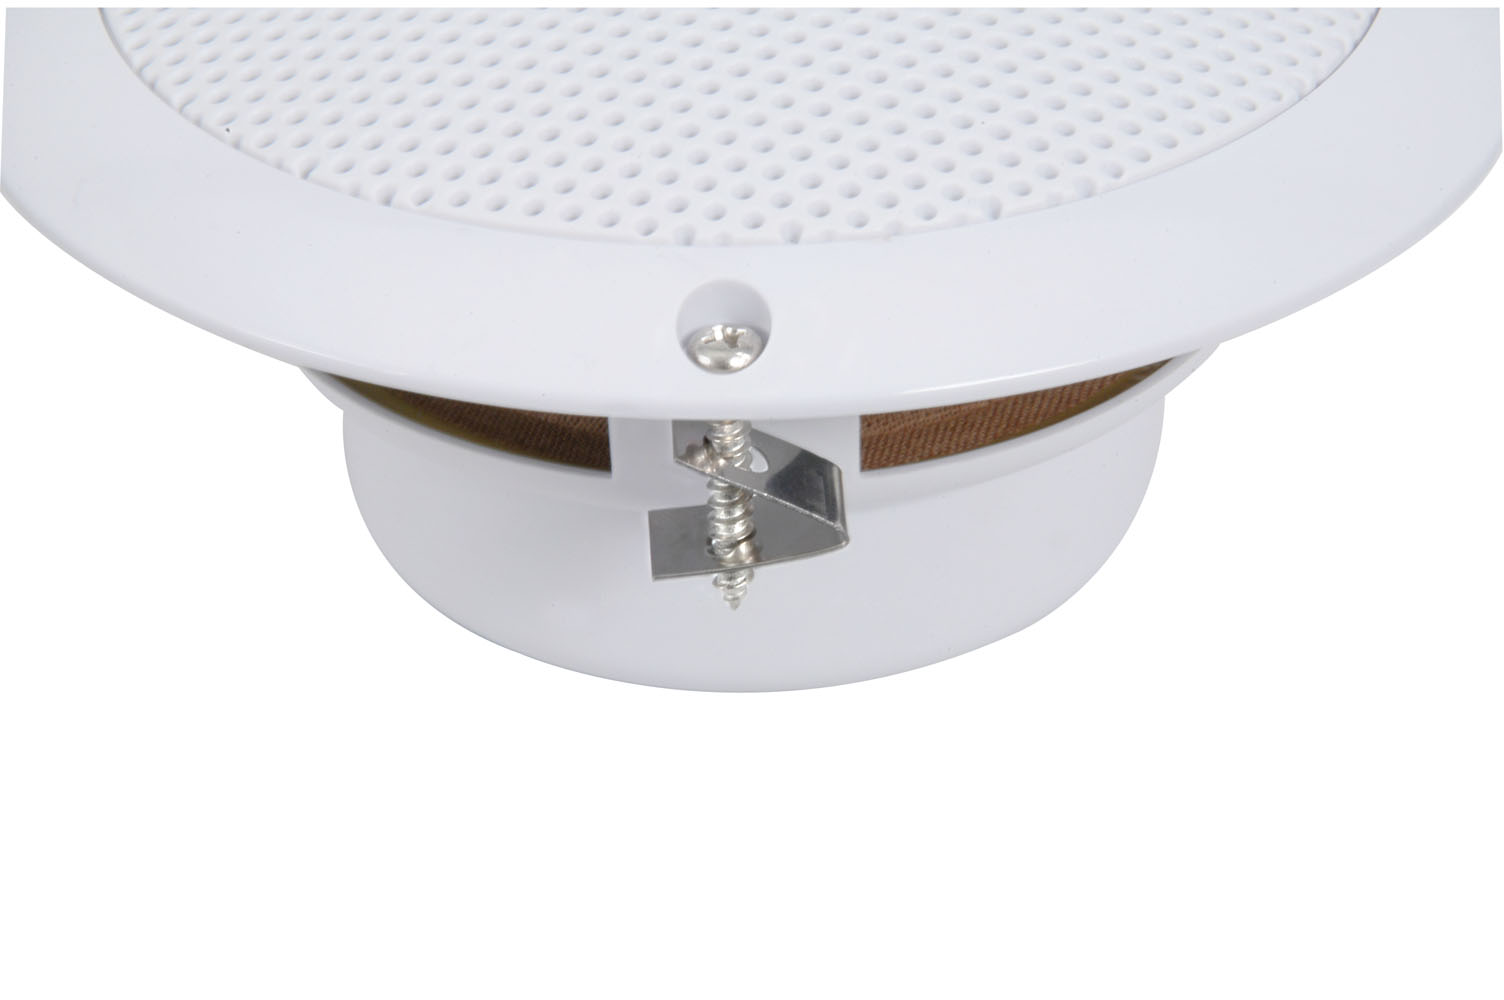 2x waterproof bathroom kitchen patio ceiling speakers 13cm 5 80w max 8 ohms ebay for Ceiling speakers for bathroom